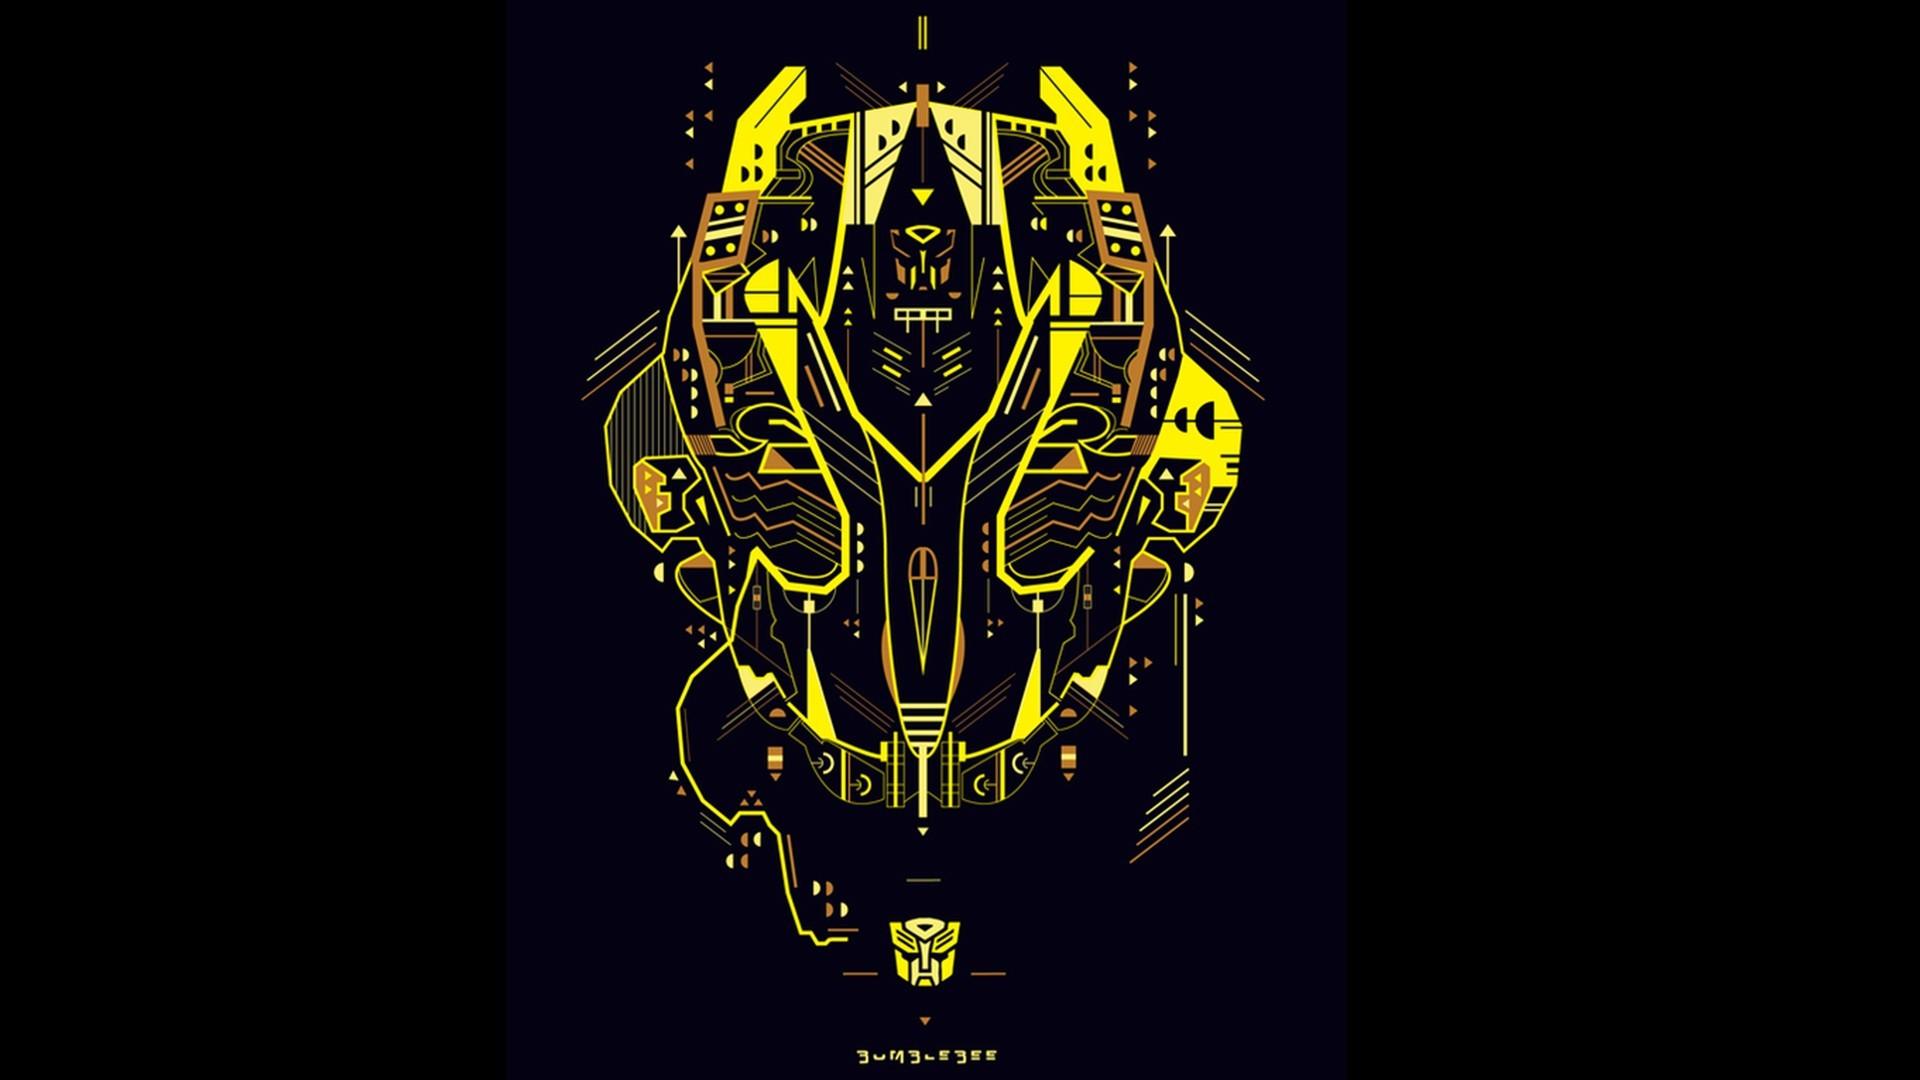 Transformers High Definition Wallpaper 1920×1080